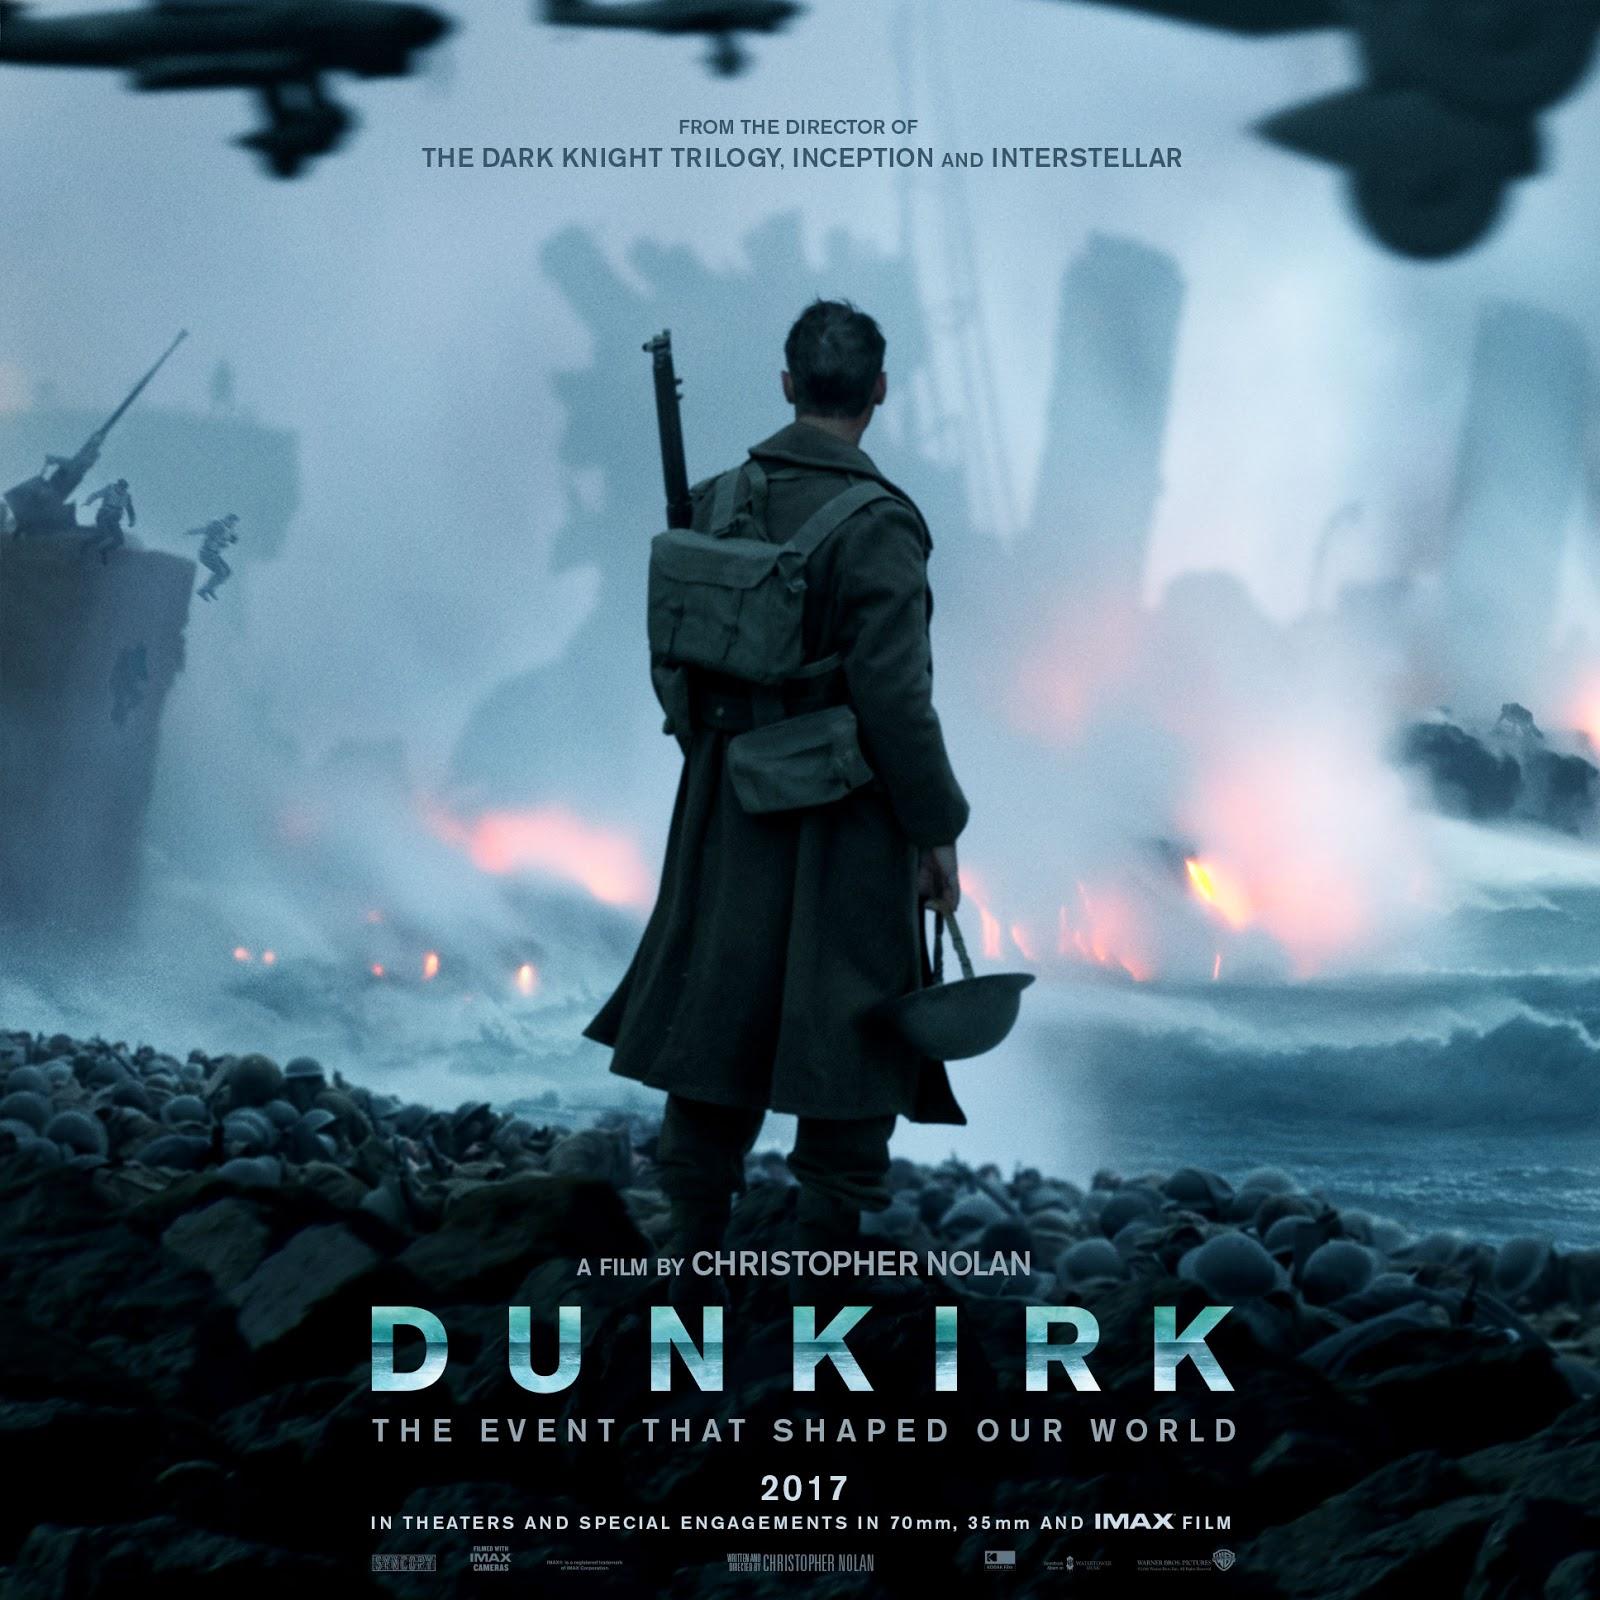 Paula: Dunkirk